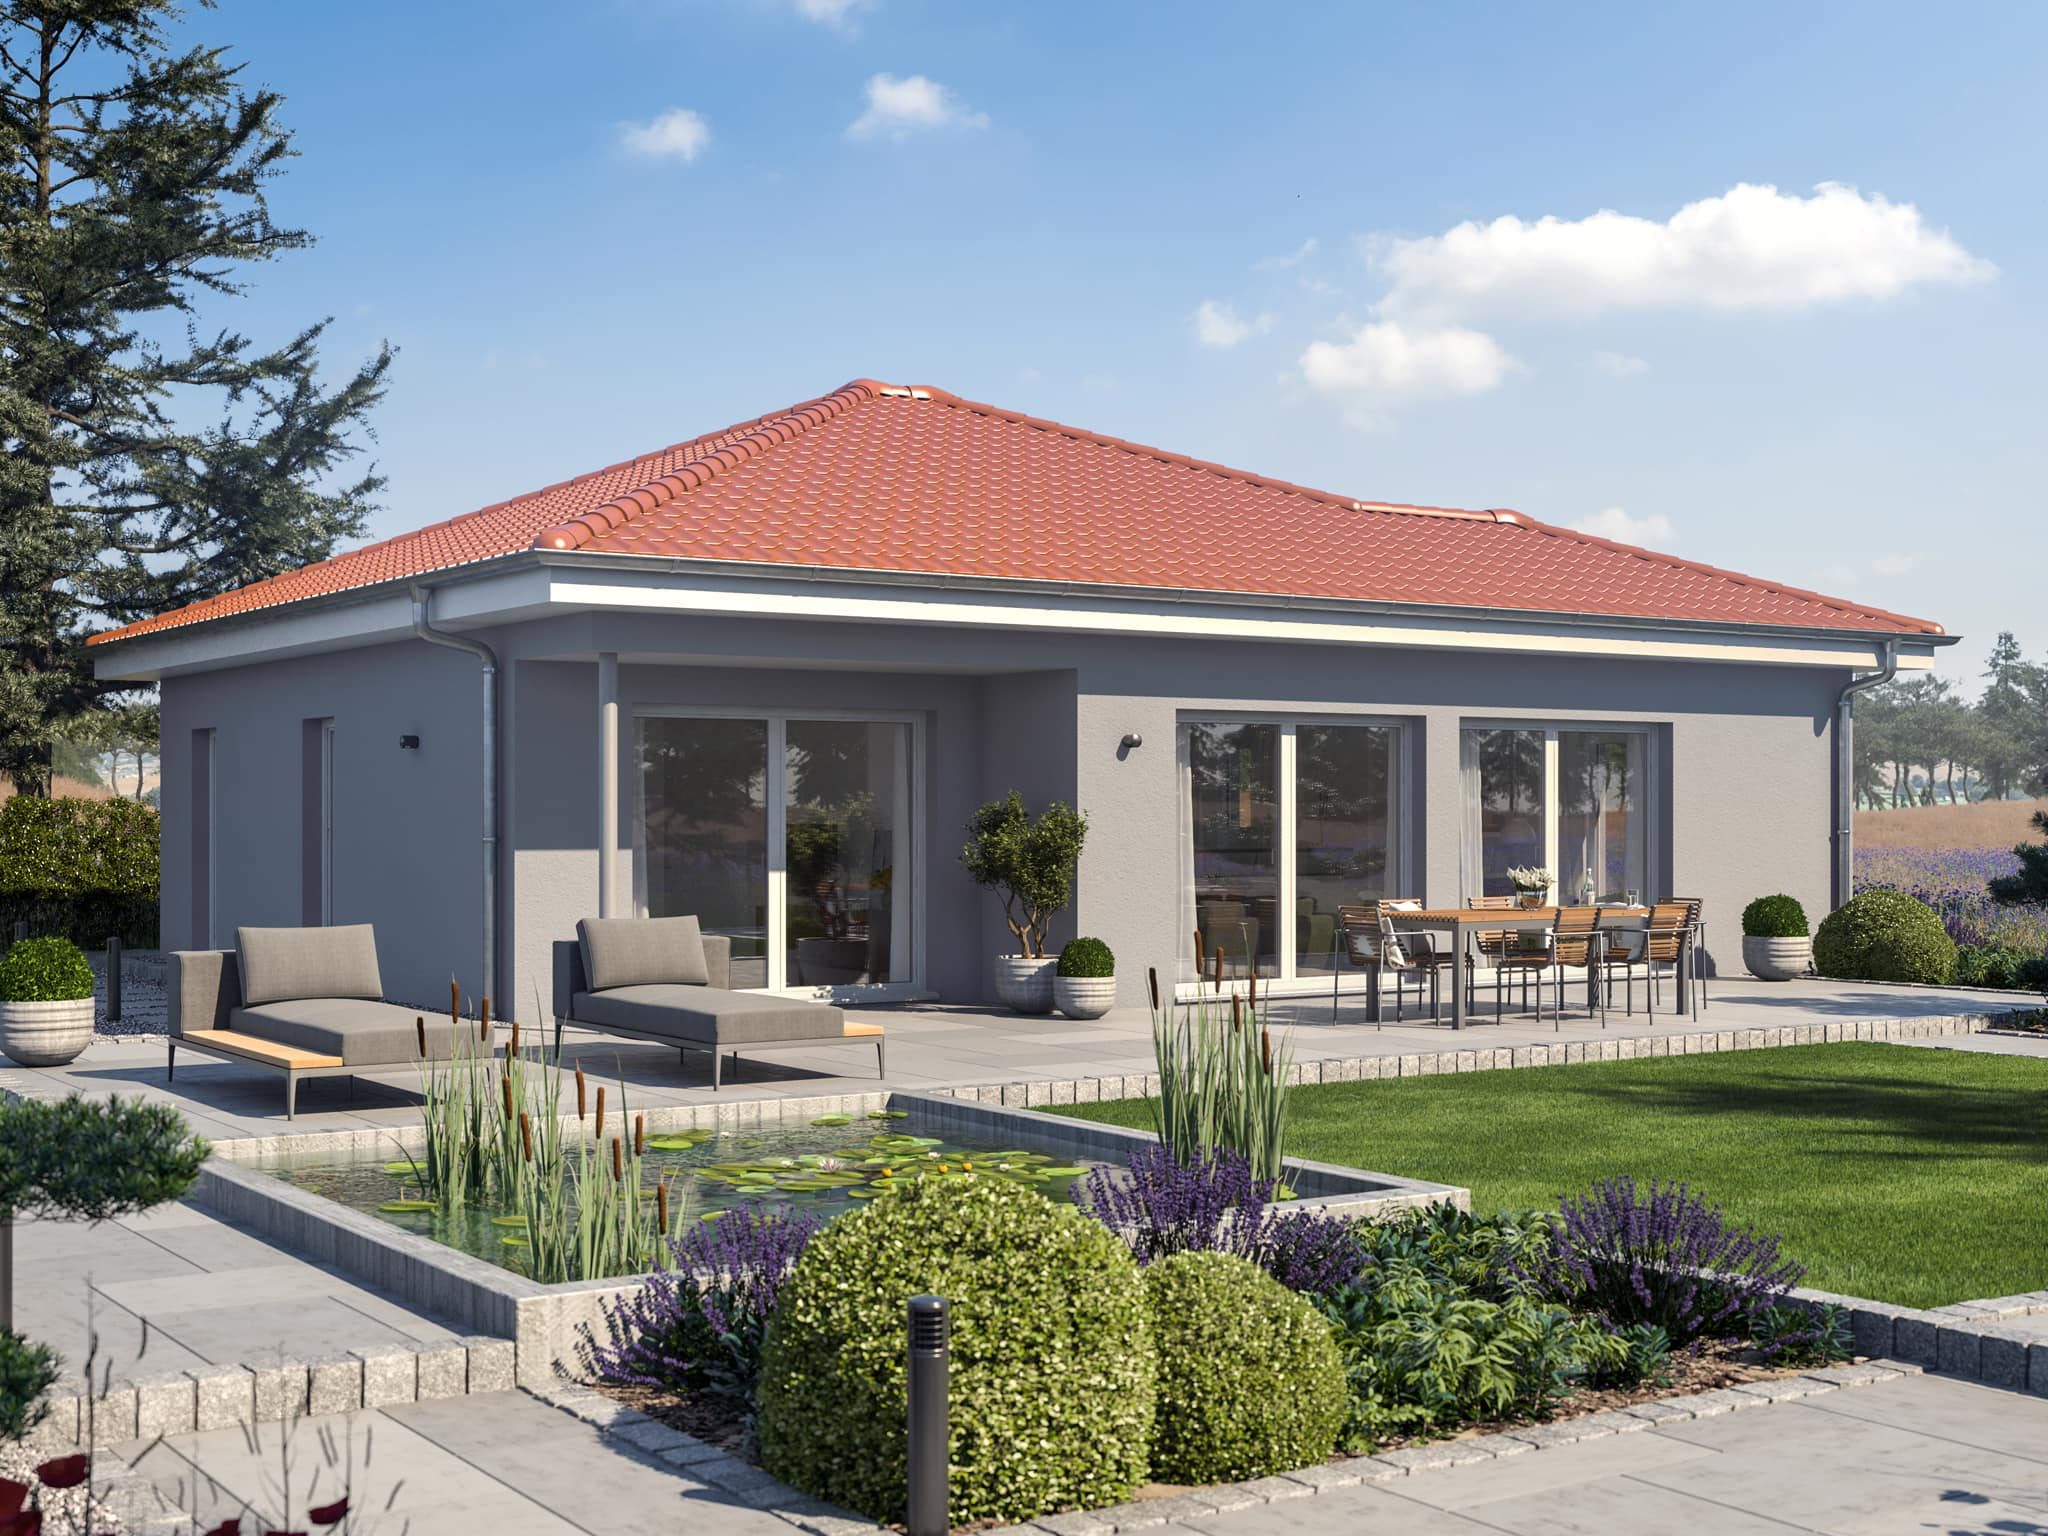 Fertighaus Bungalow Walmdach AMBIENCE 77 V3 Bien Zenker Einfamilienhaus - Haus bauen Ideen HausbauDirekt.de